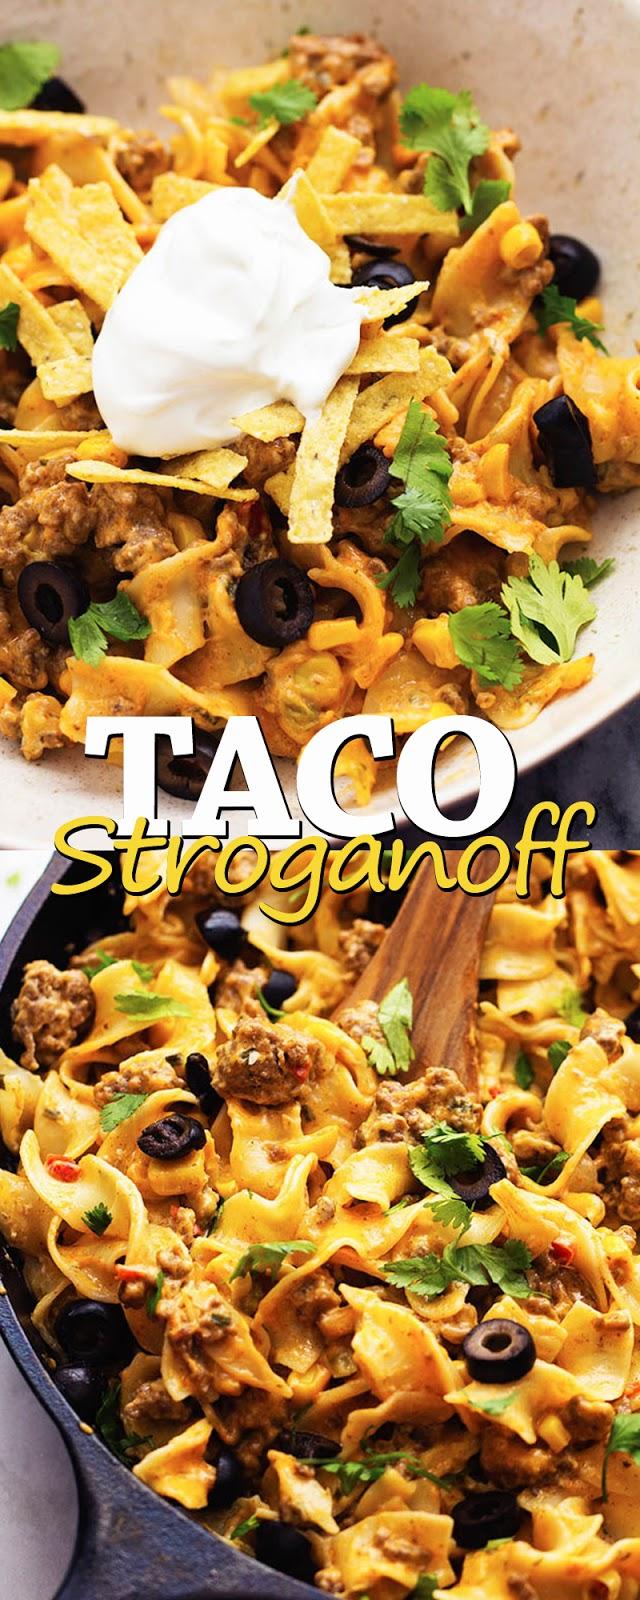 TACO STROGANOFF